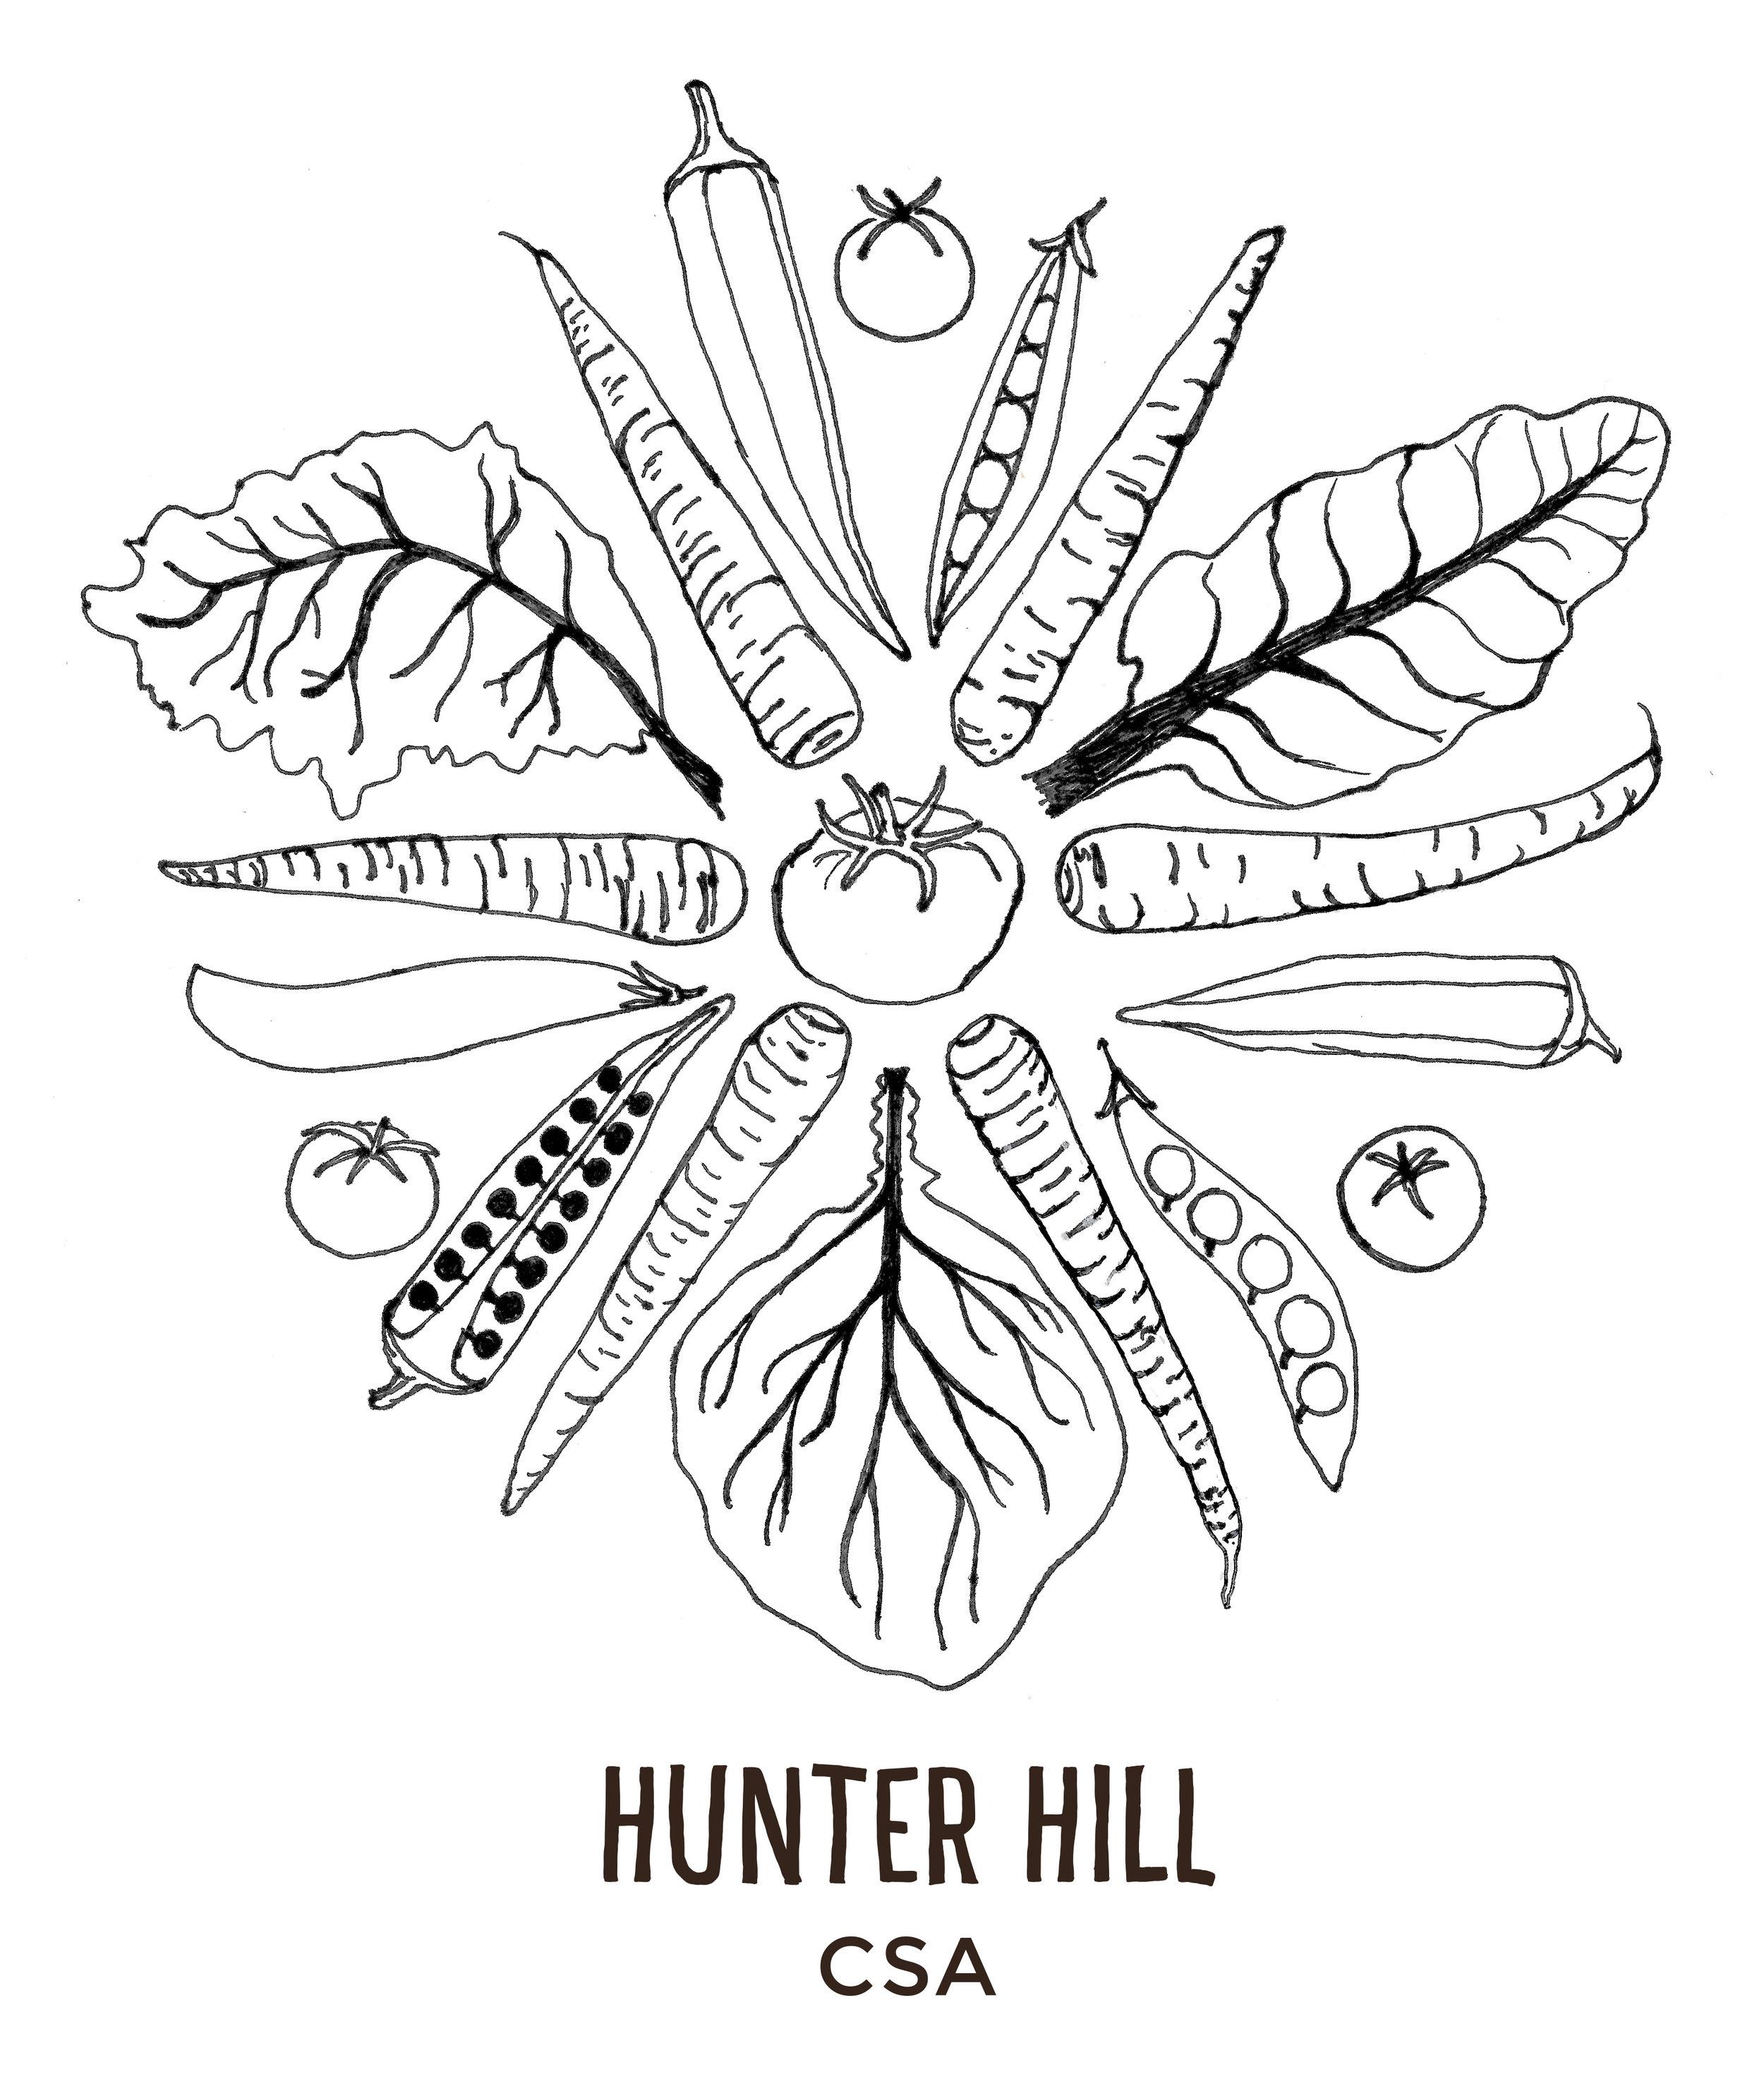 NW hunter hill logo.jpg